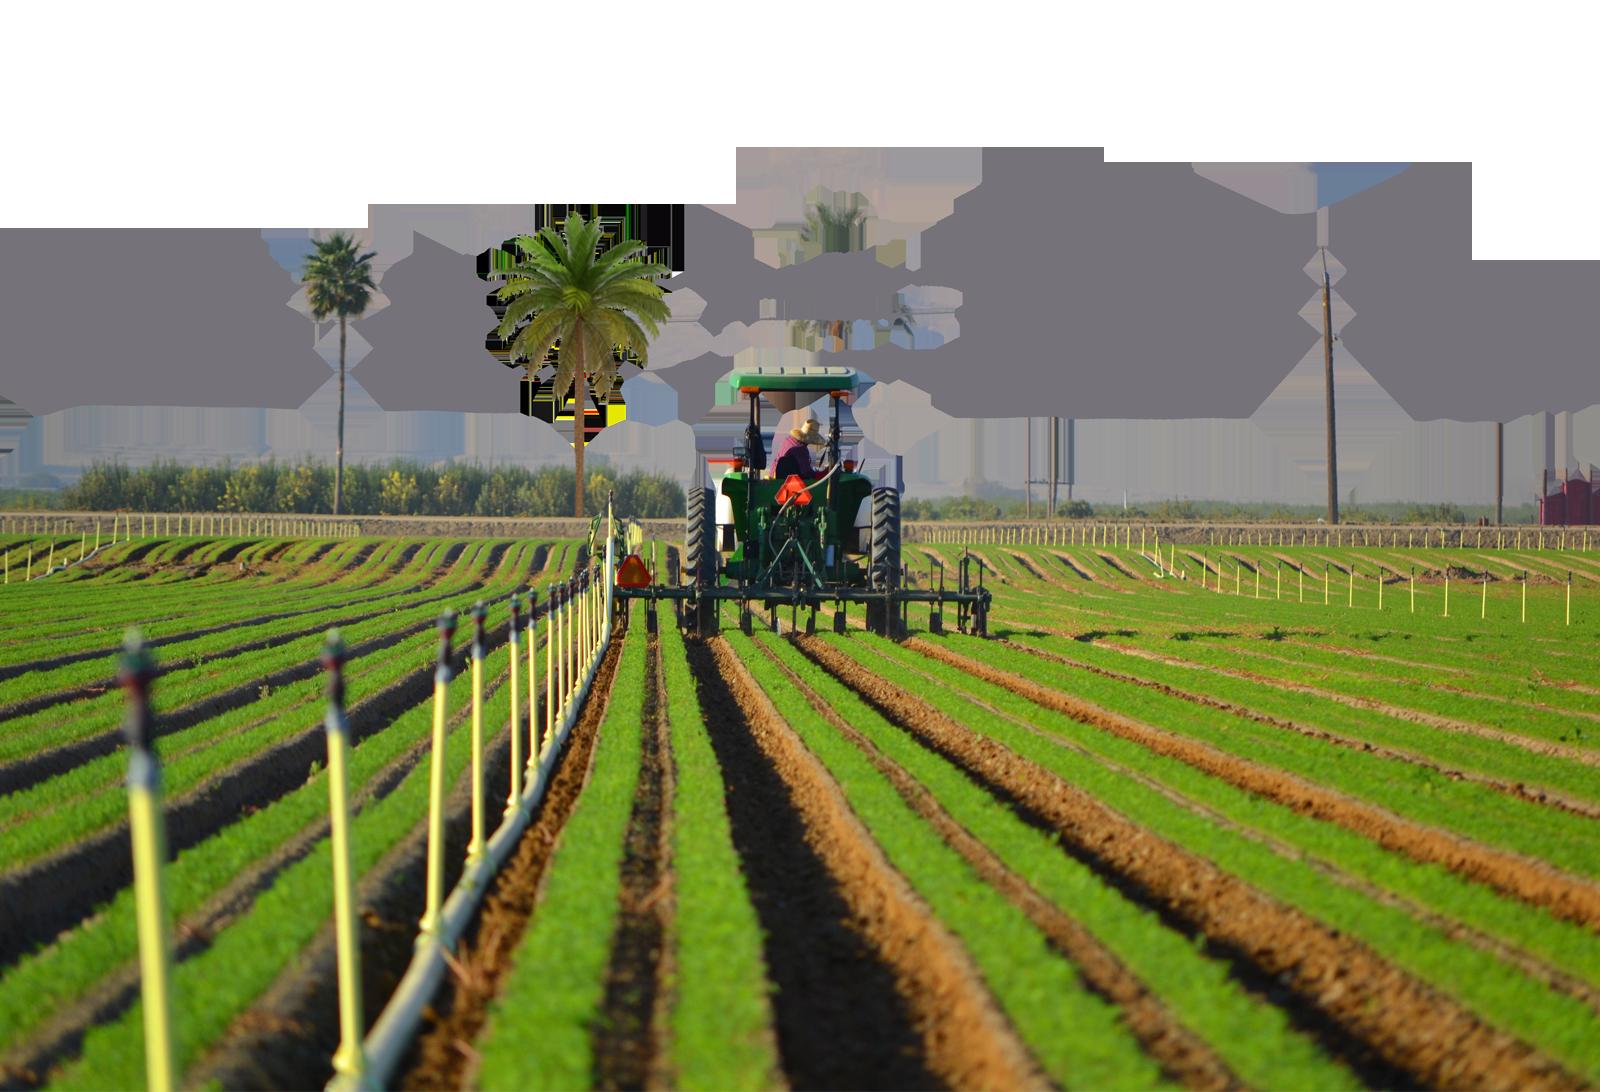 Land clipart crop field. Plants lessons tes teach